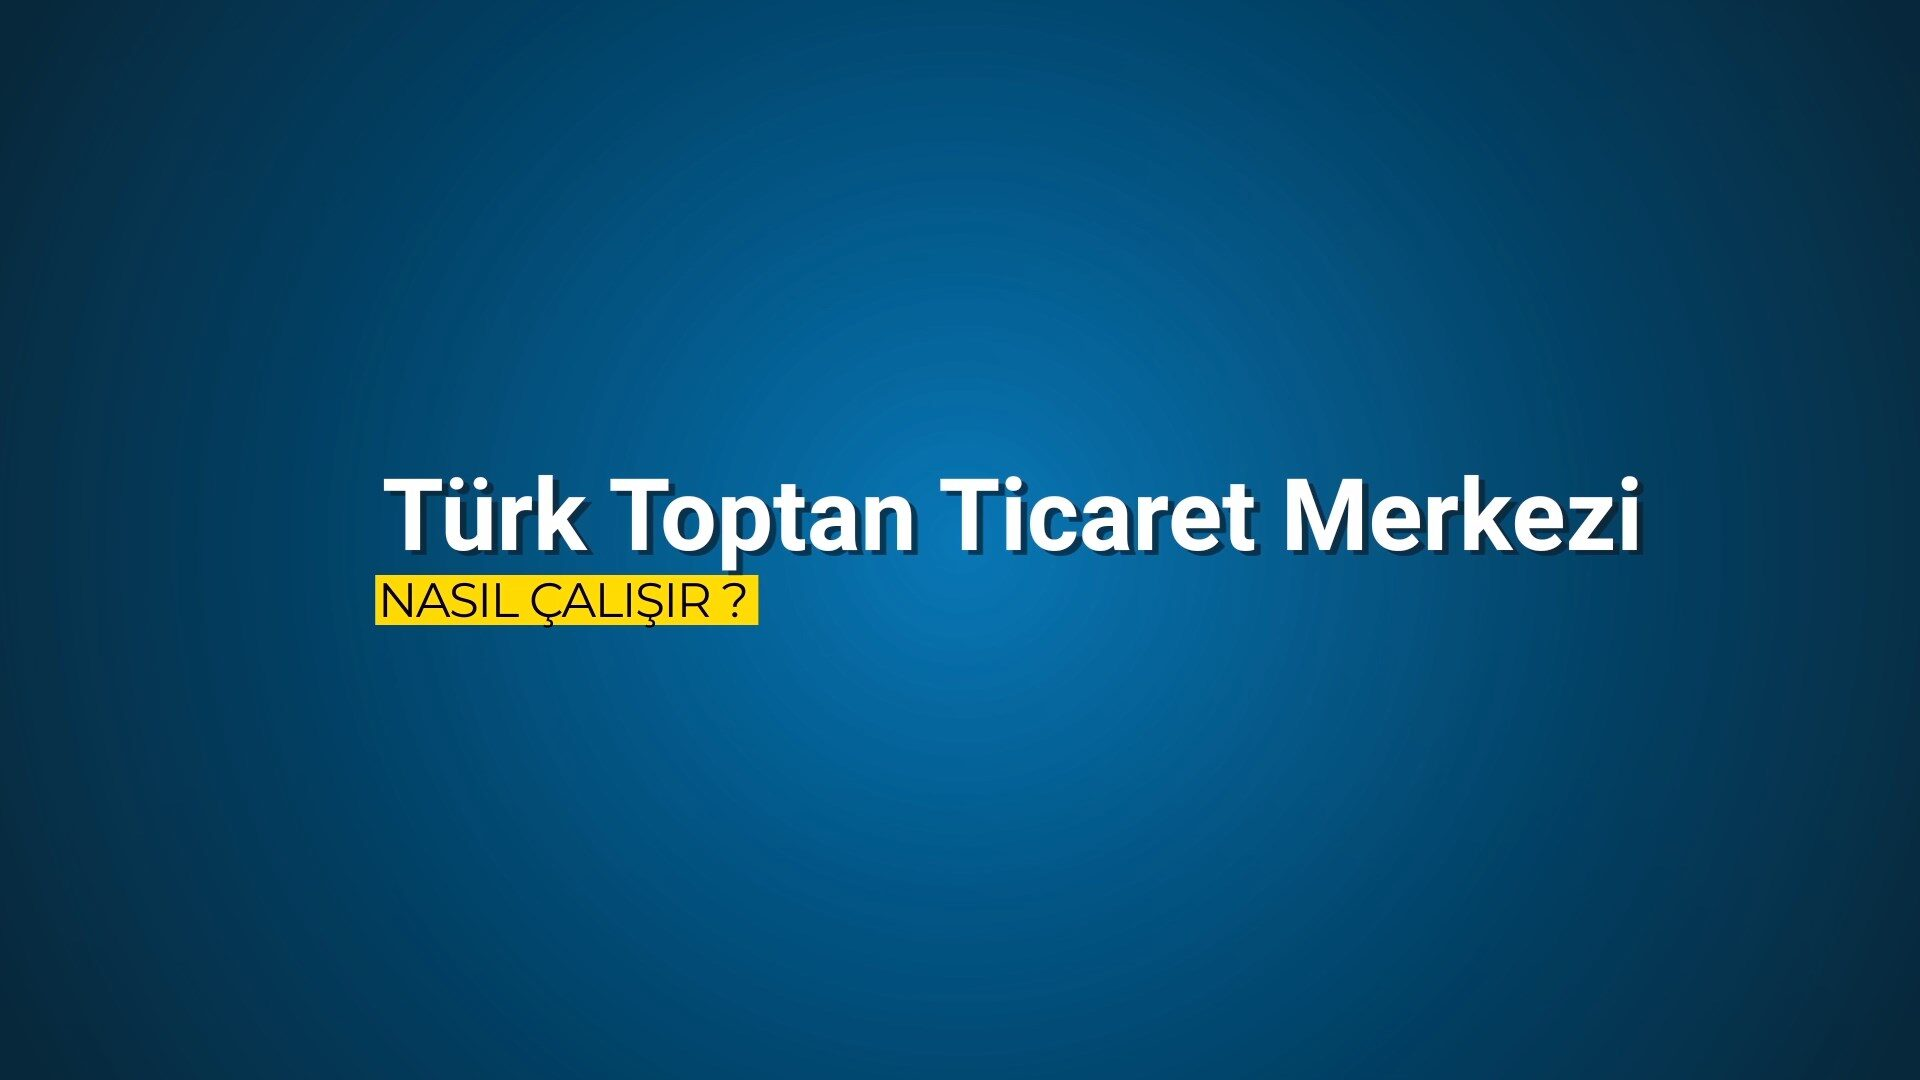 TürkTicaretMerkezi4.mp4 snapshot 00.02.805 1920x1080 -